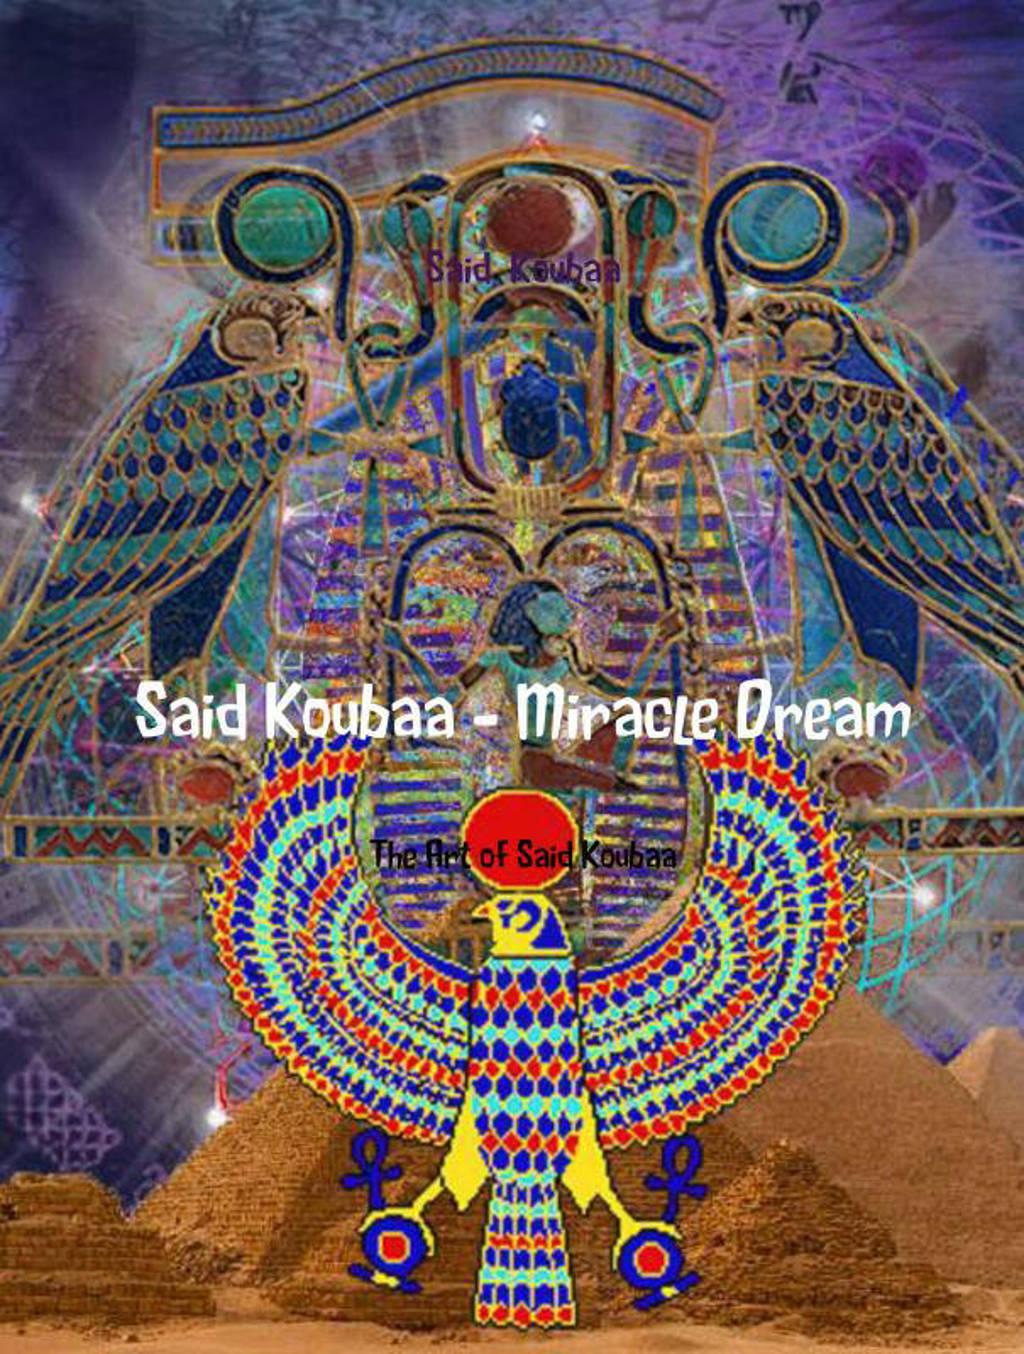 Said Koubaa - Miracle Dream - Said Koubaa